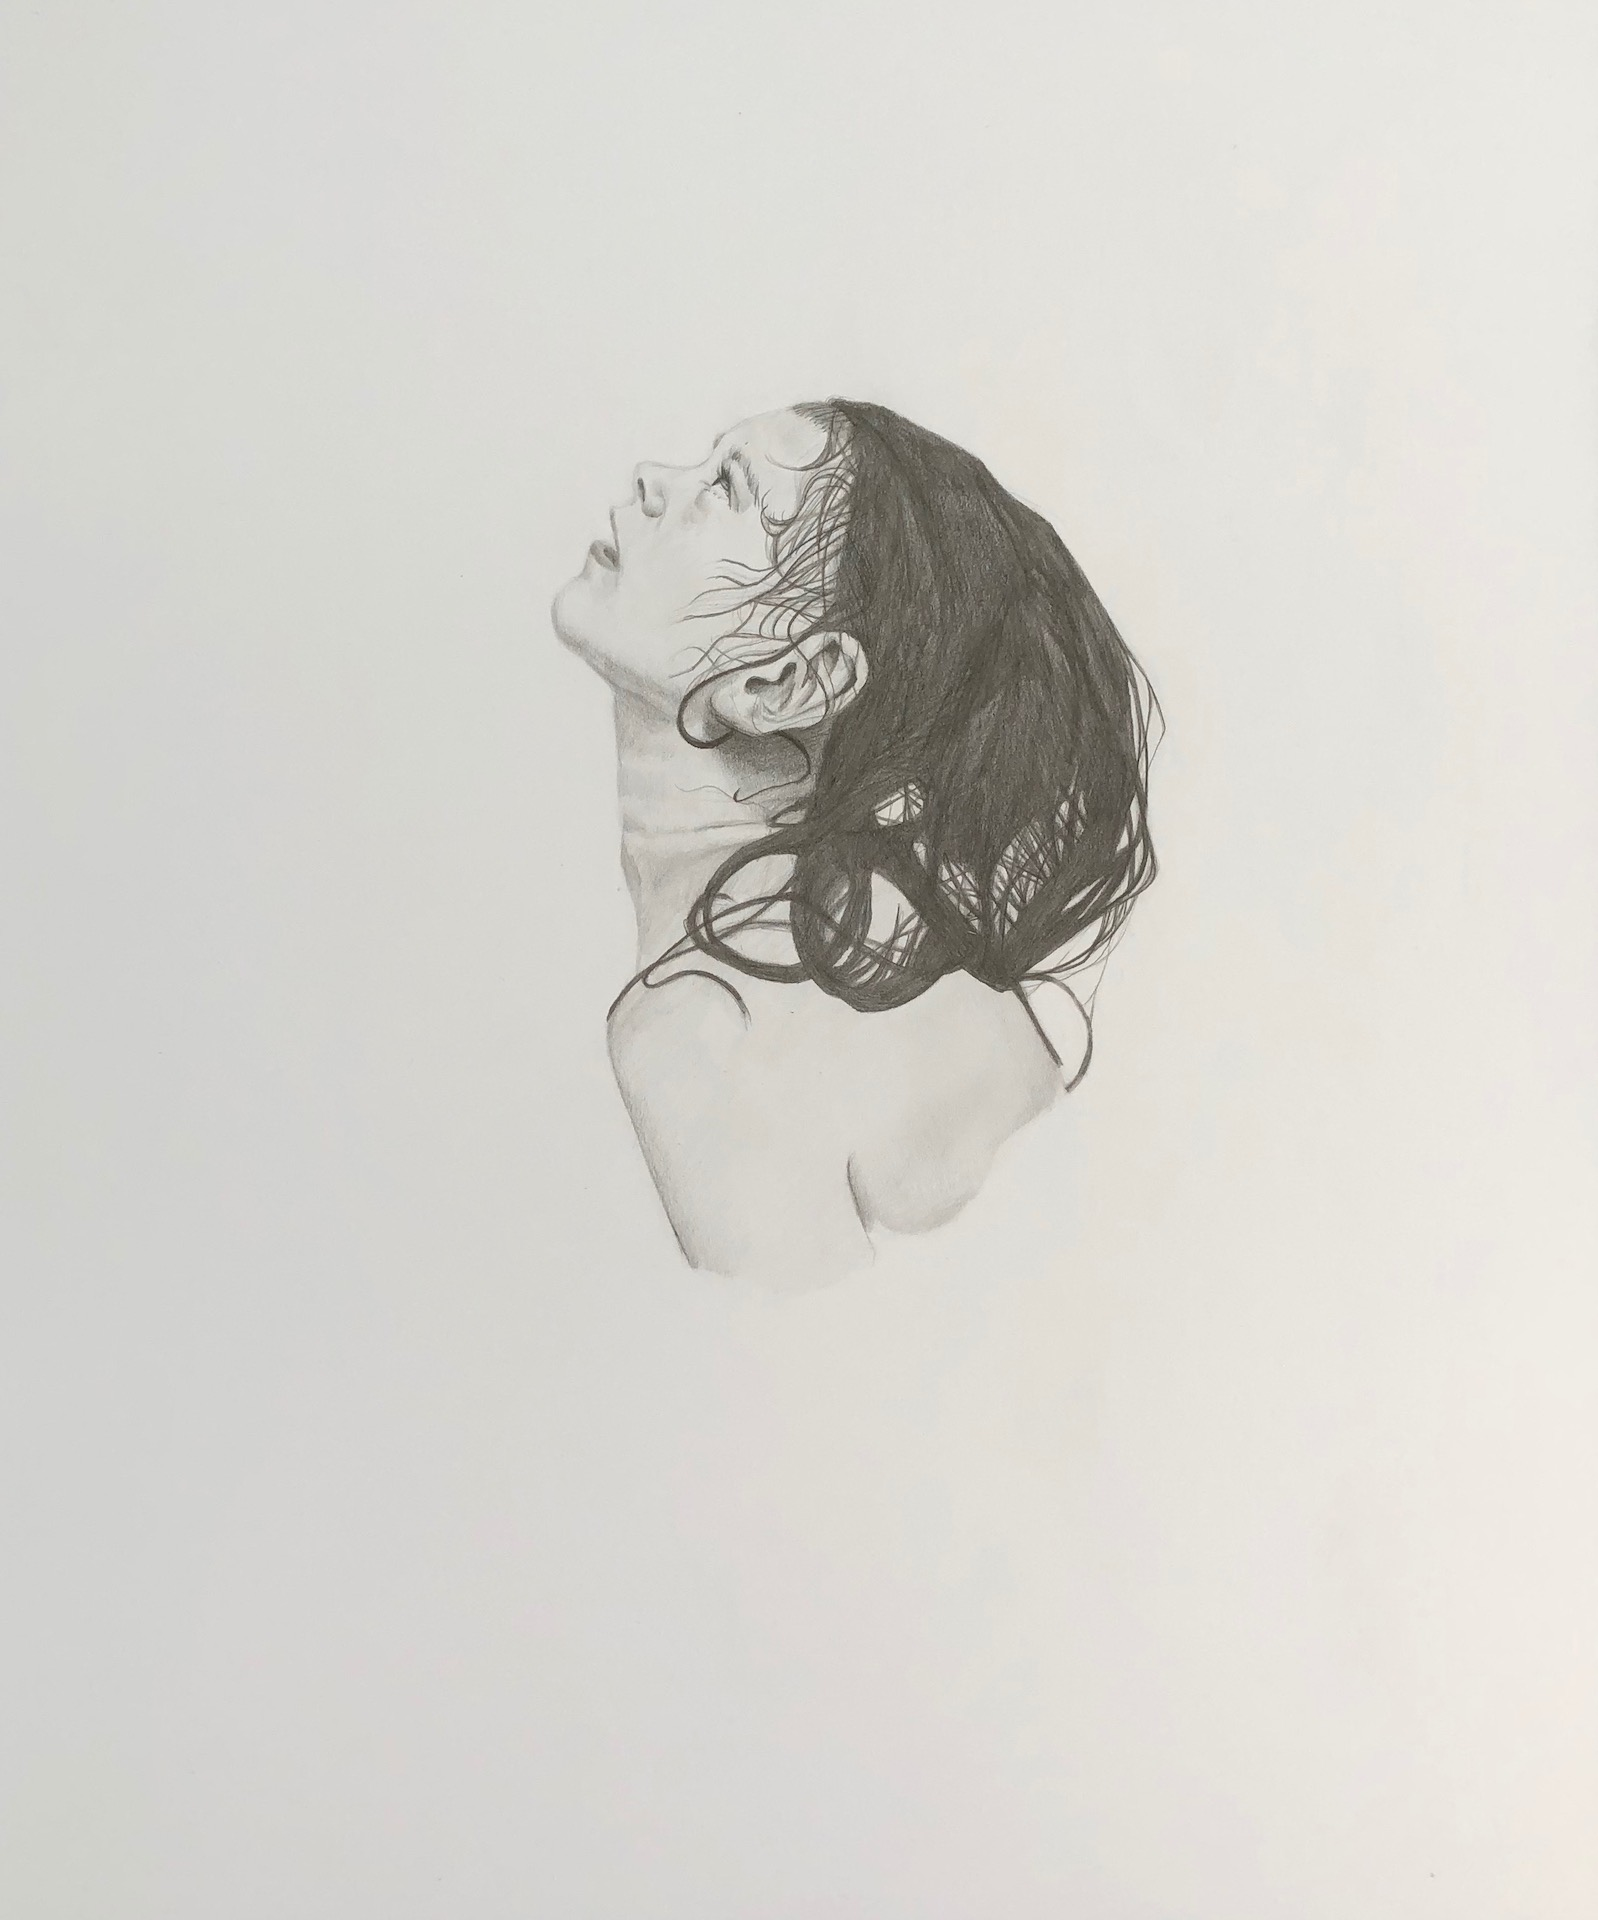 Emerged (Lily), Lindsay Higa